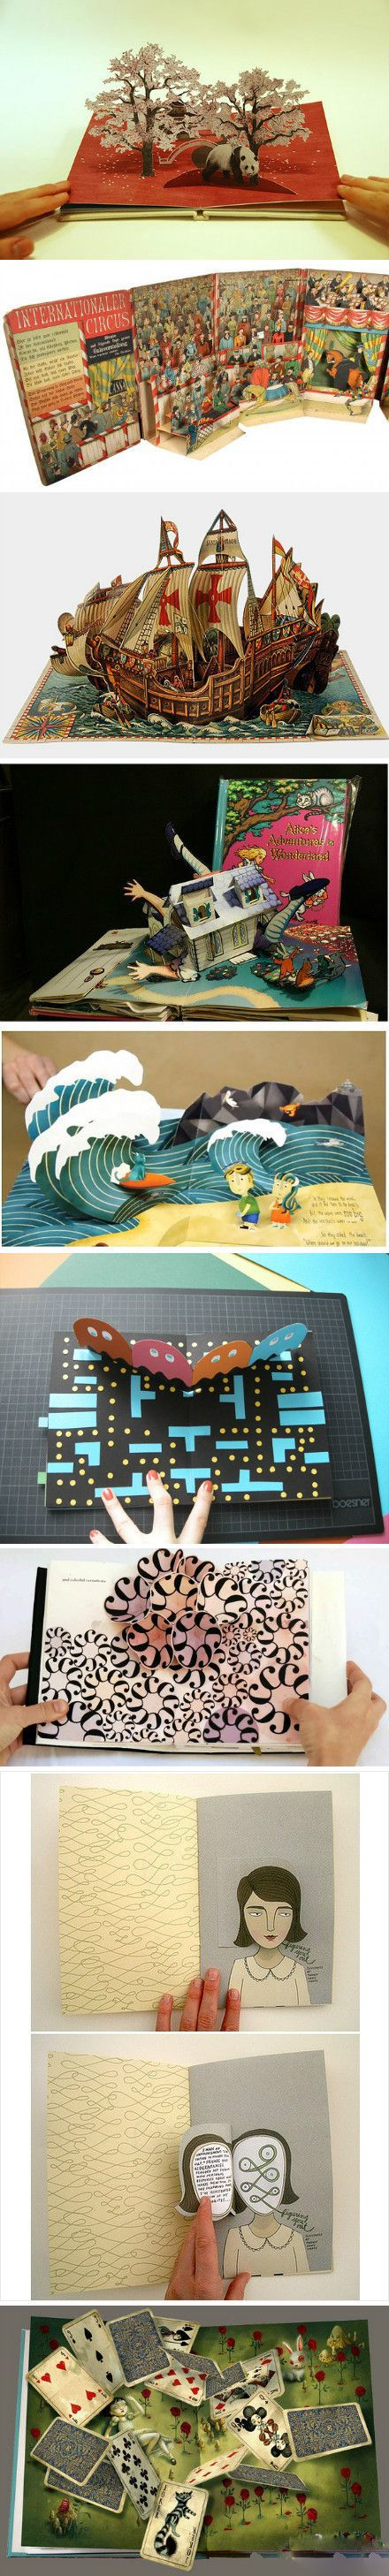 More interesting items in paper sculpting!